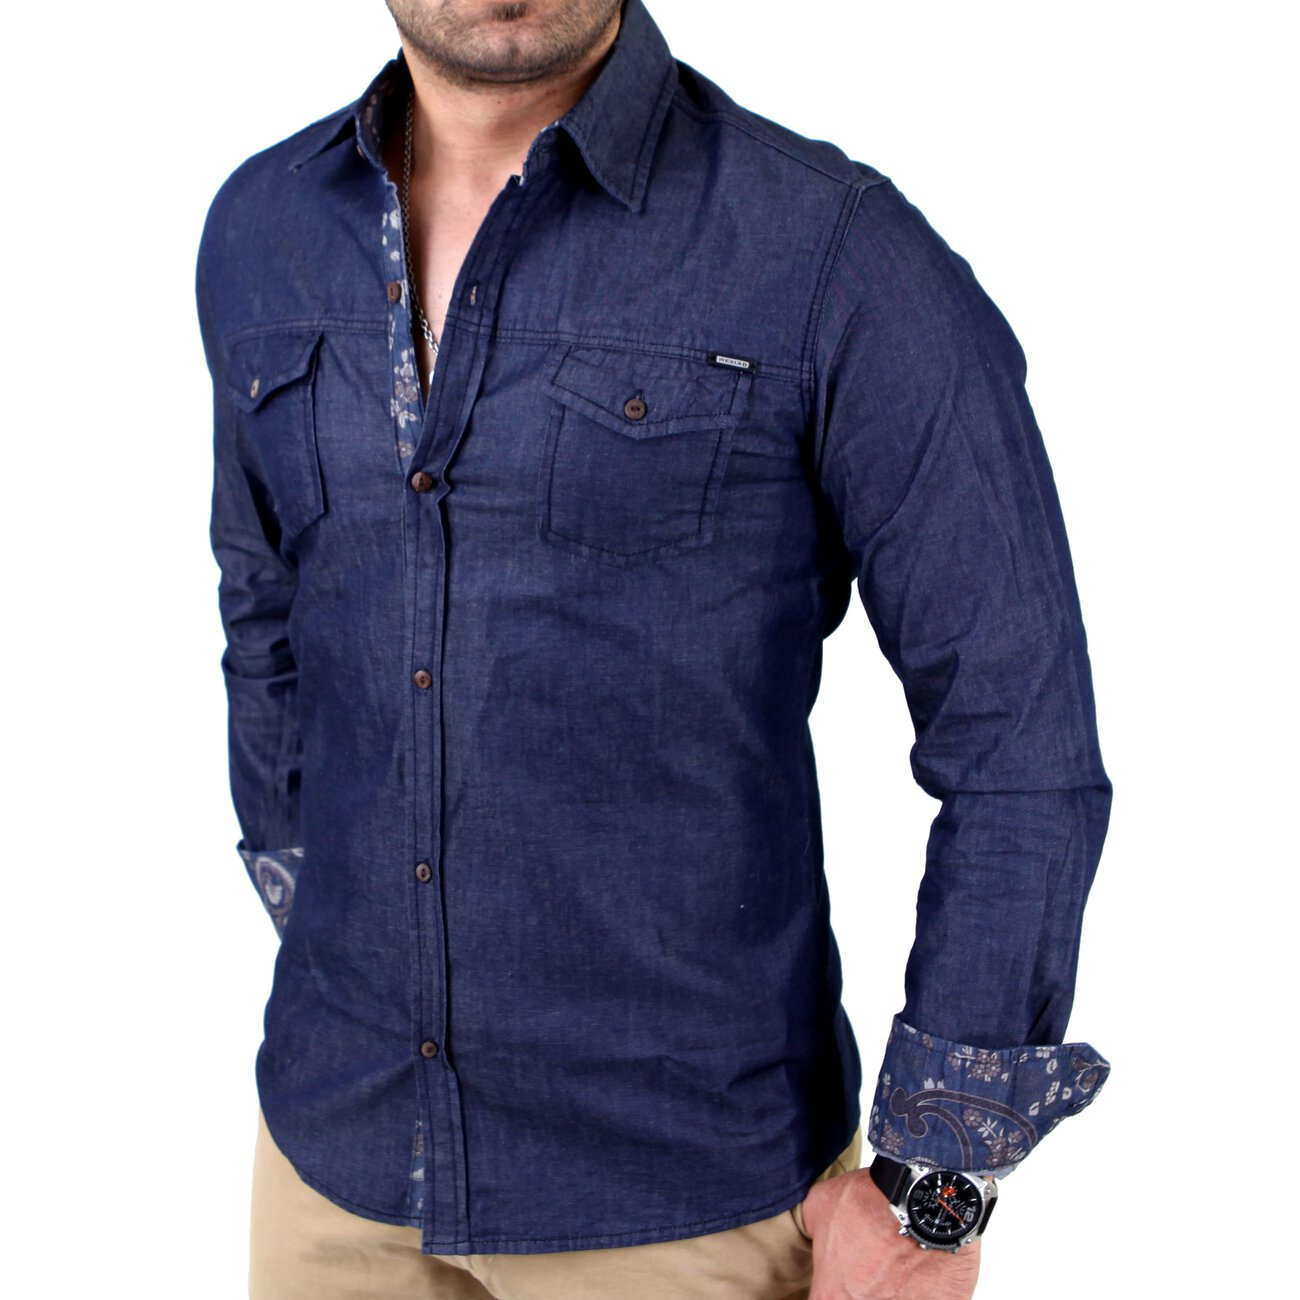 jeanshemd dunkelblau premium resald hemd g nstig kaufen. Black Bedroom Furniture Sets. Home Design Ideas